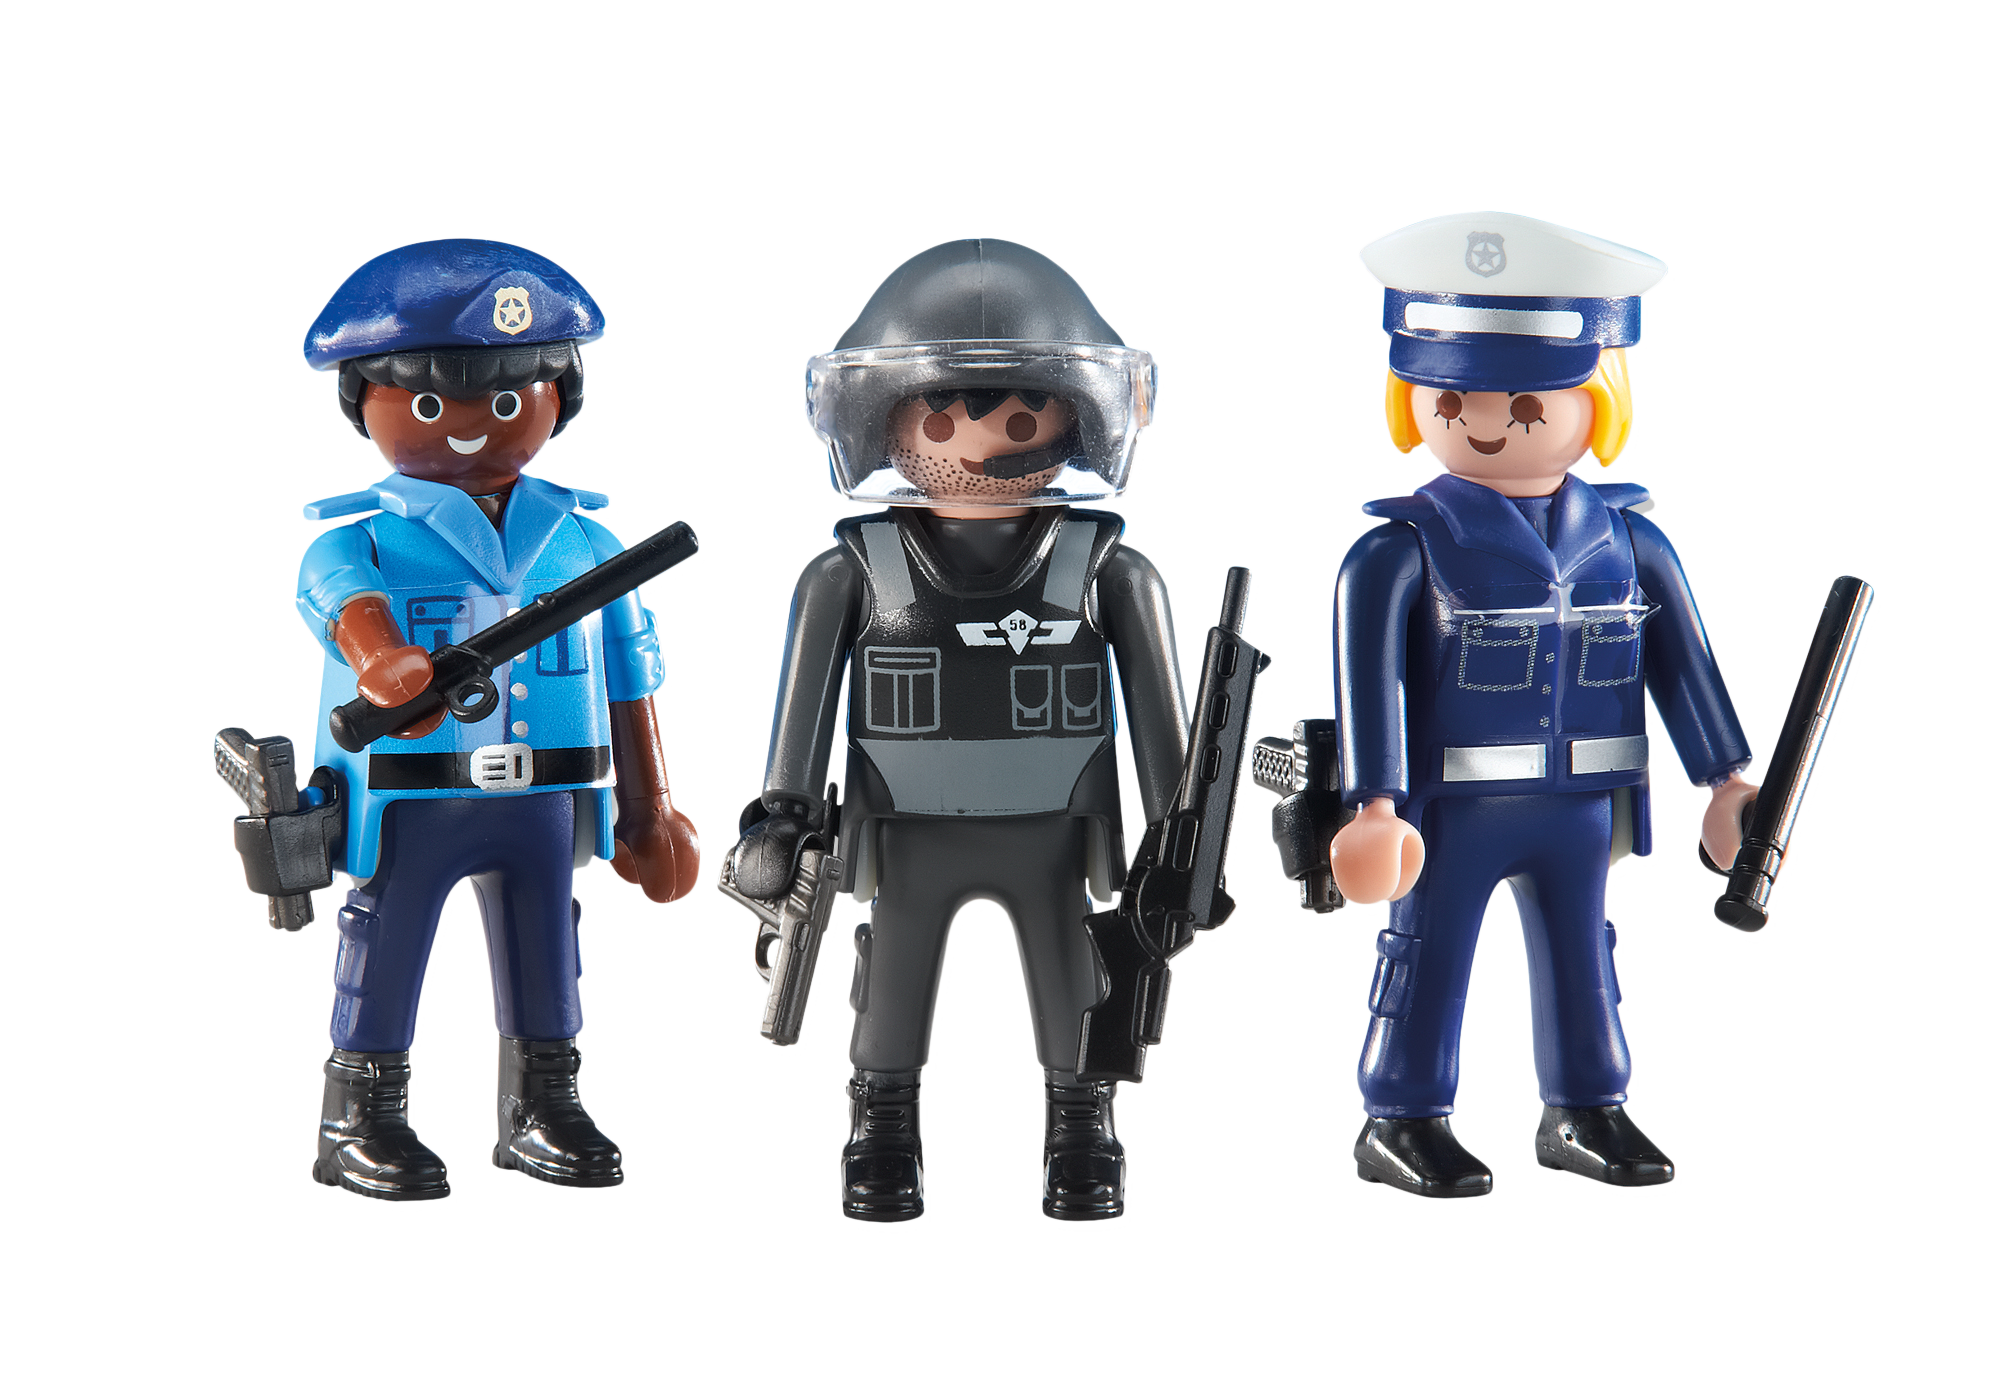 6501_product_detail/3 Polizisten